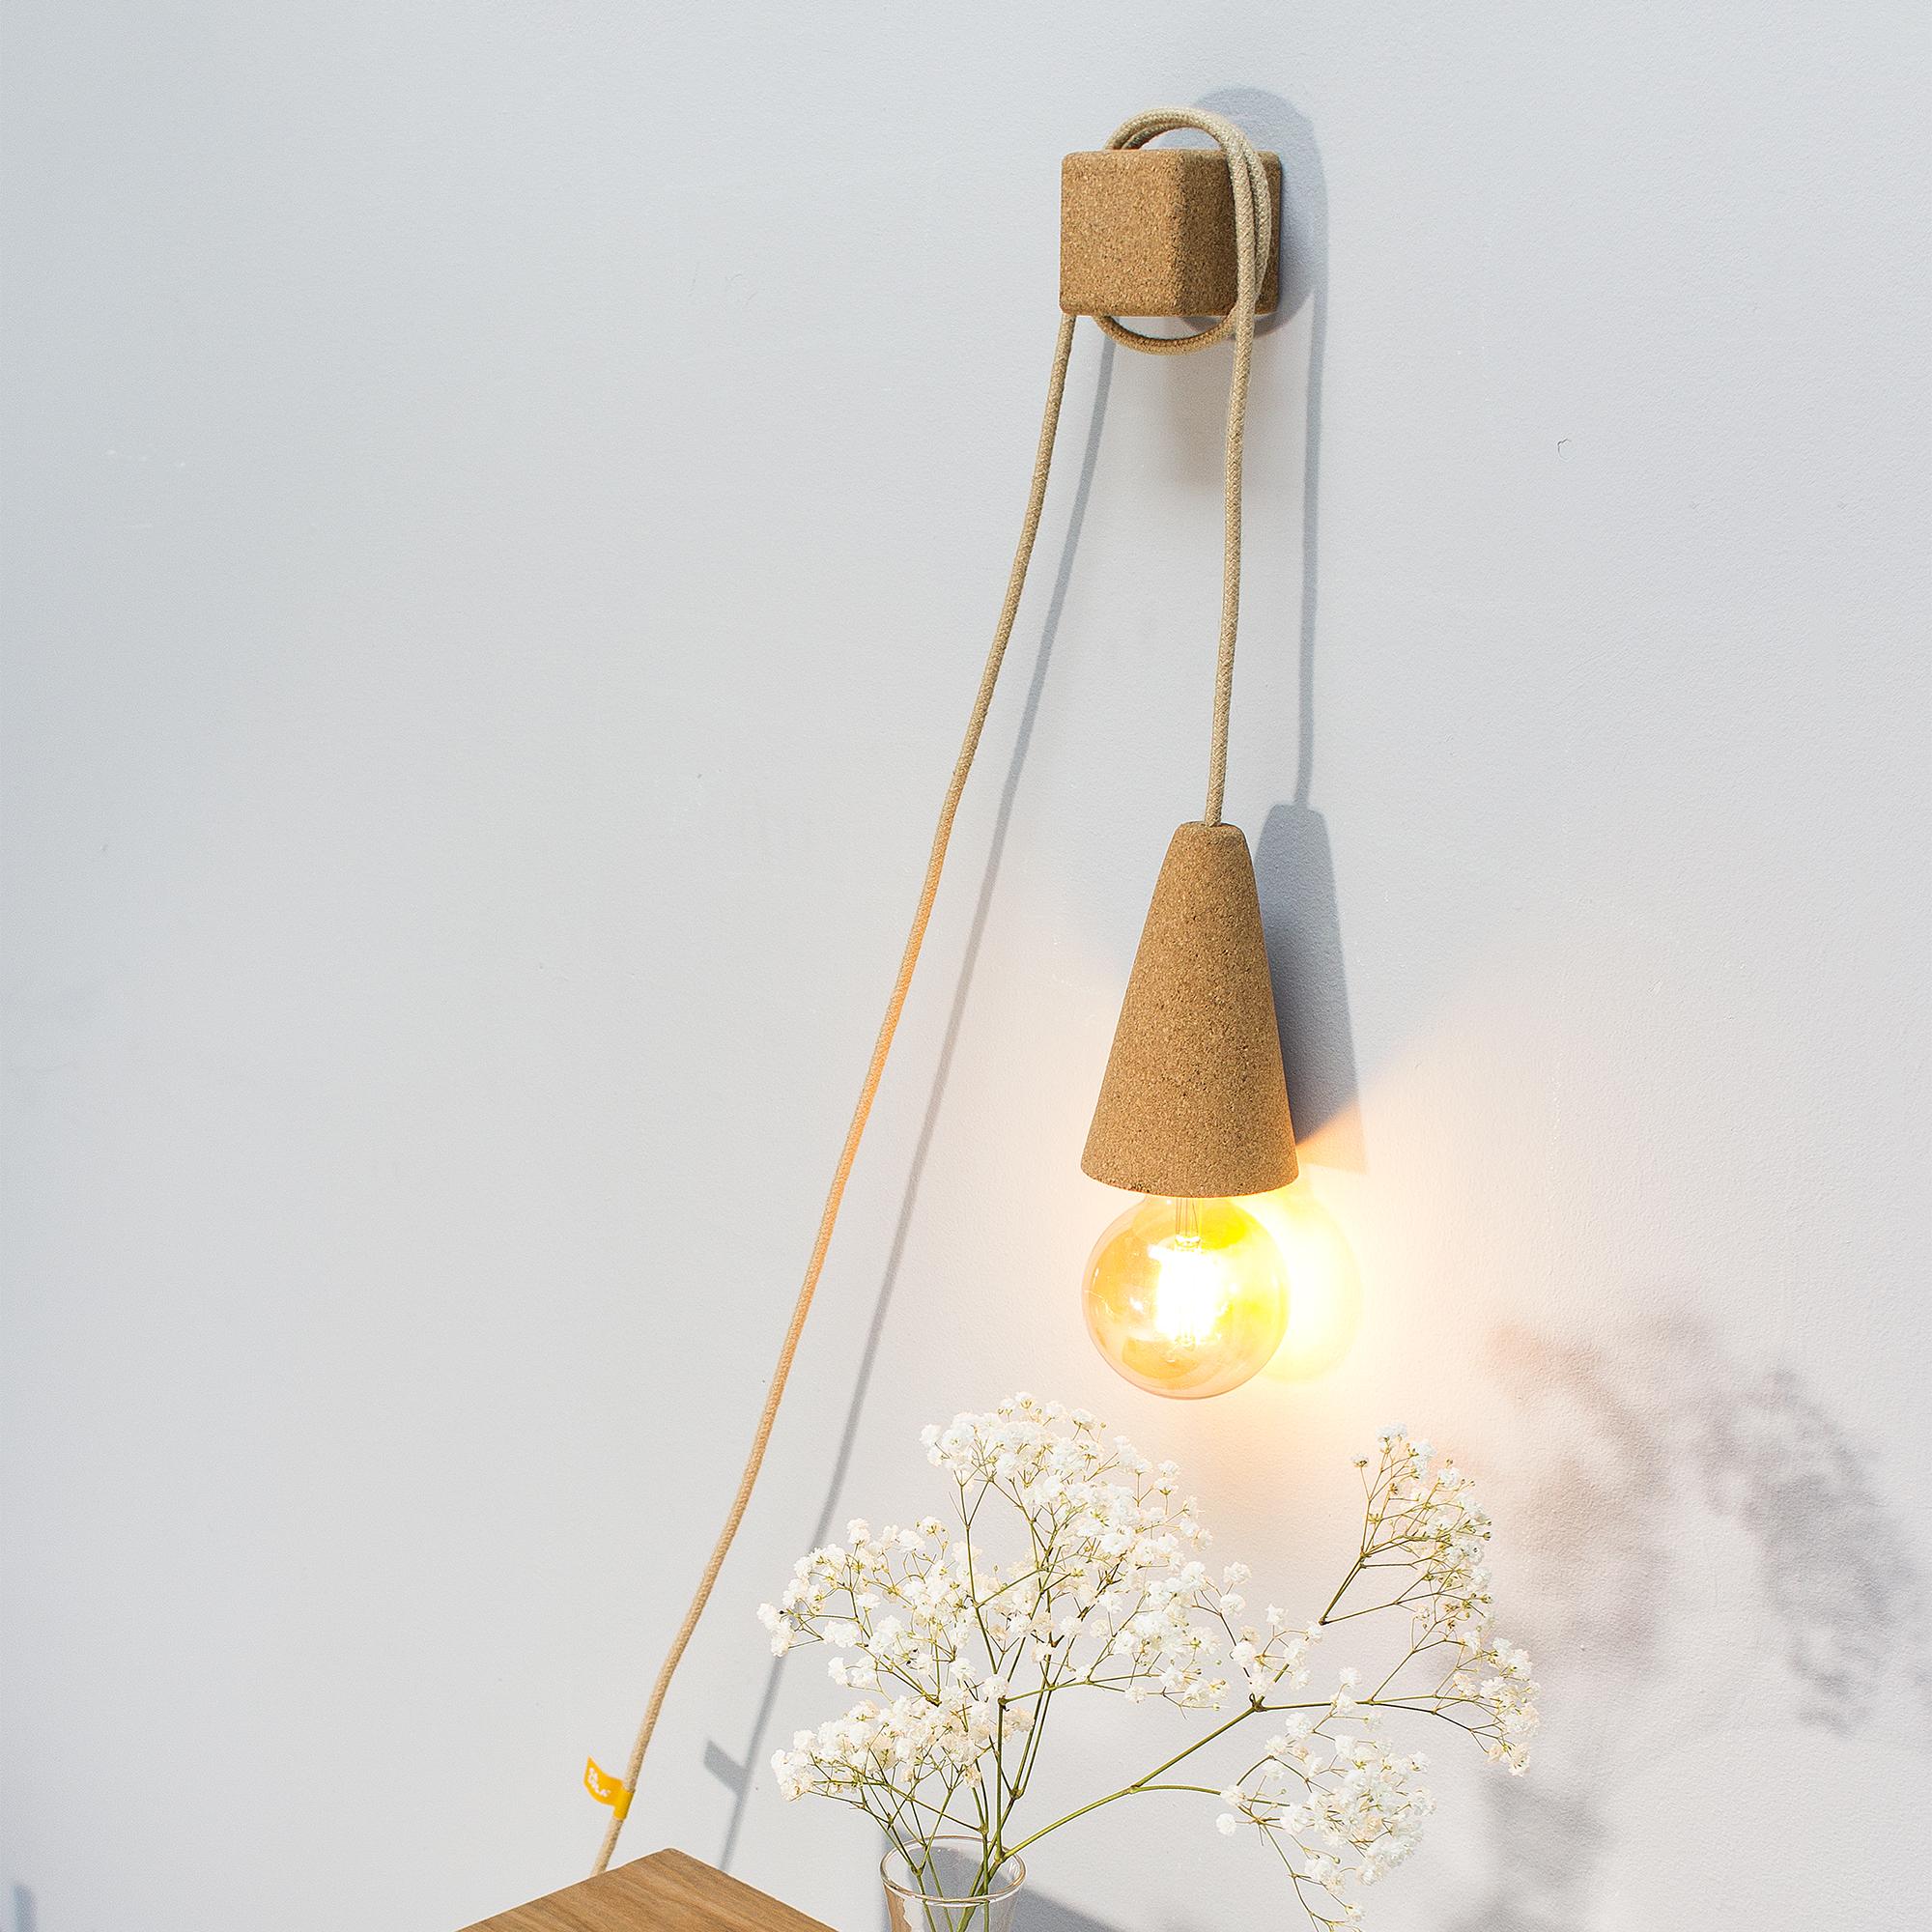 sq-Galula-Sino-Pose-lamp-cork-beige-12.jpg